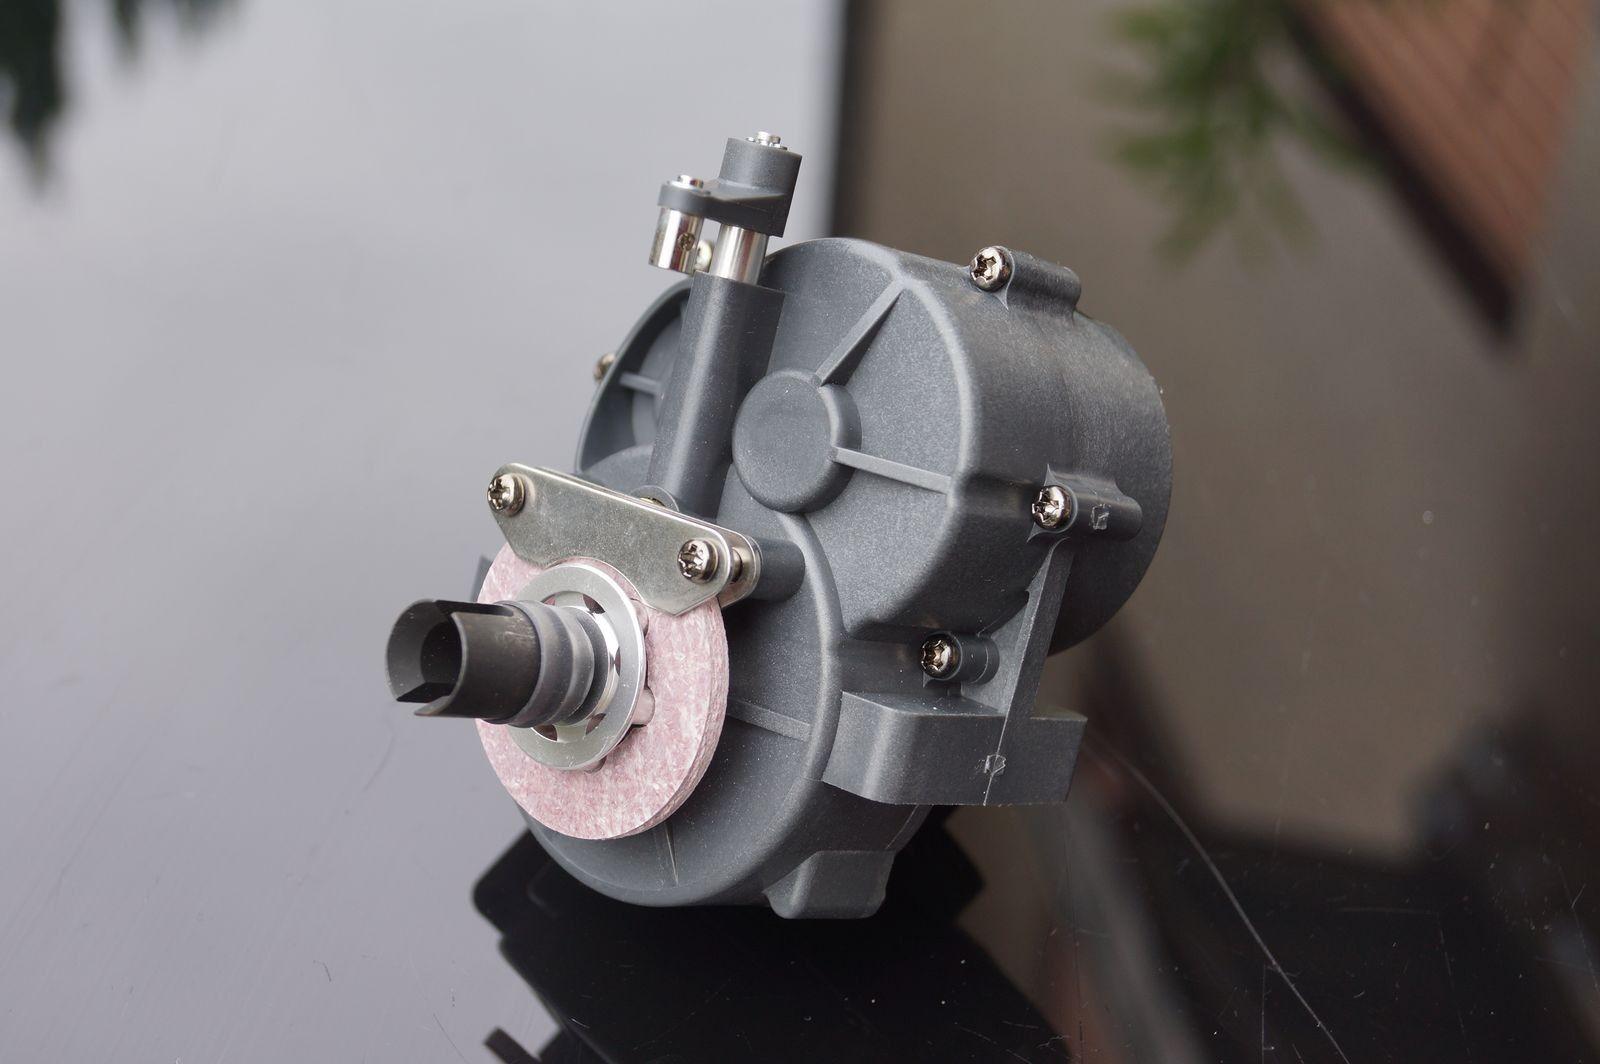 Tamiya 8084097  Getriebe komplett  TNX  TGM03  neu  ovp  sehr selten